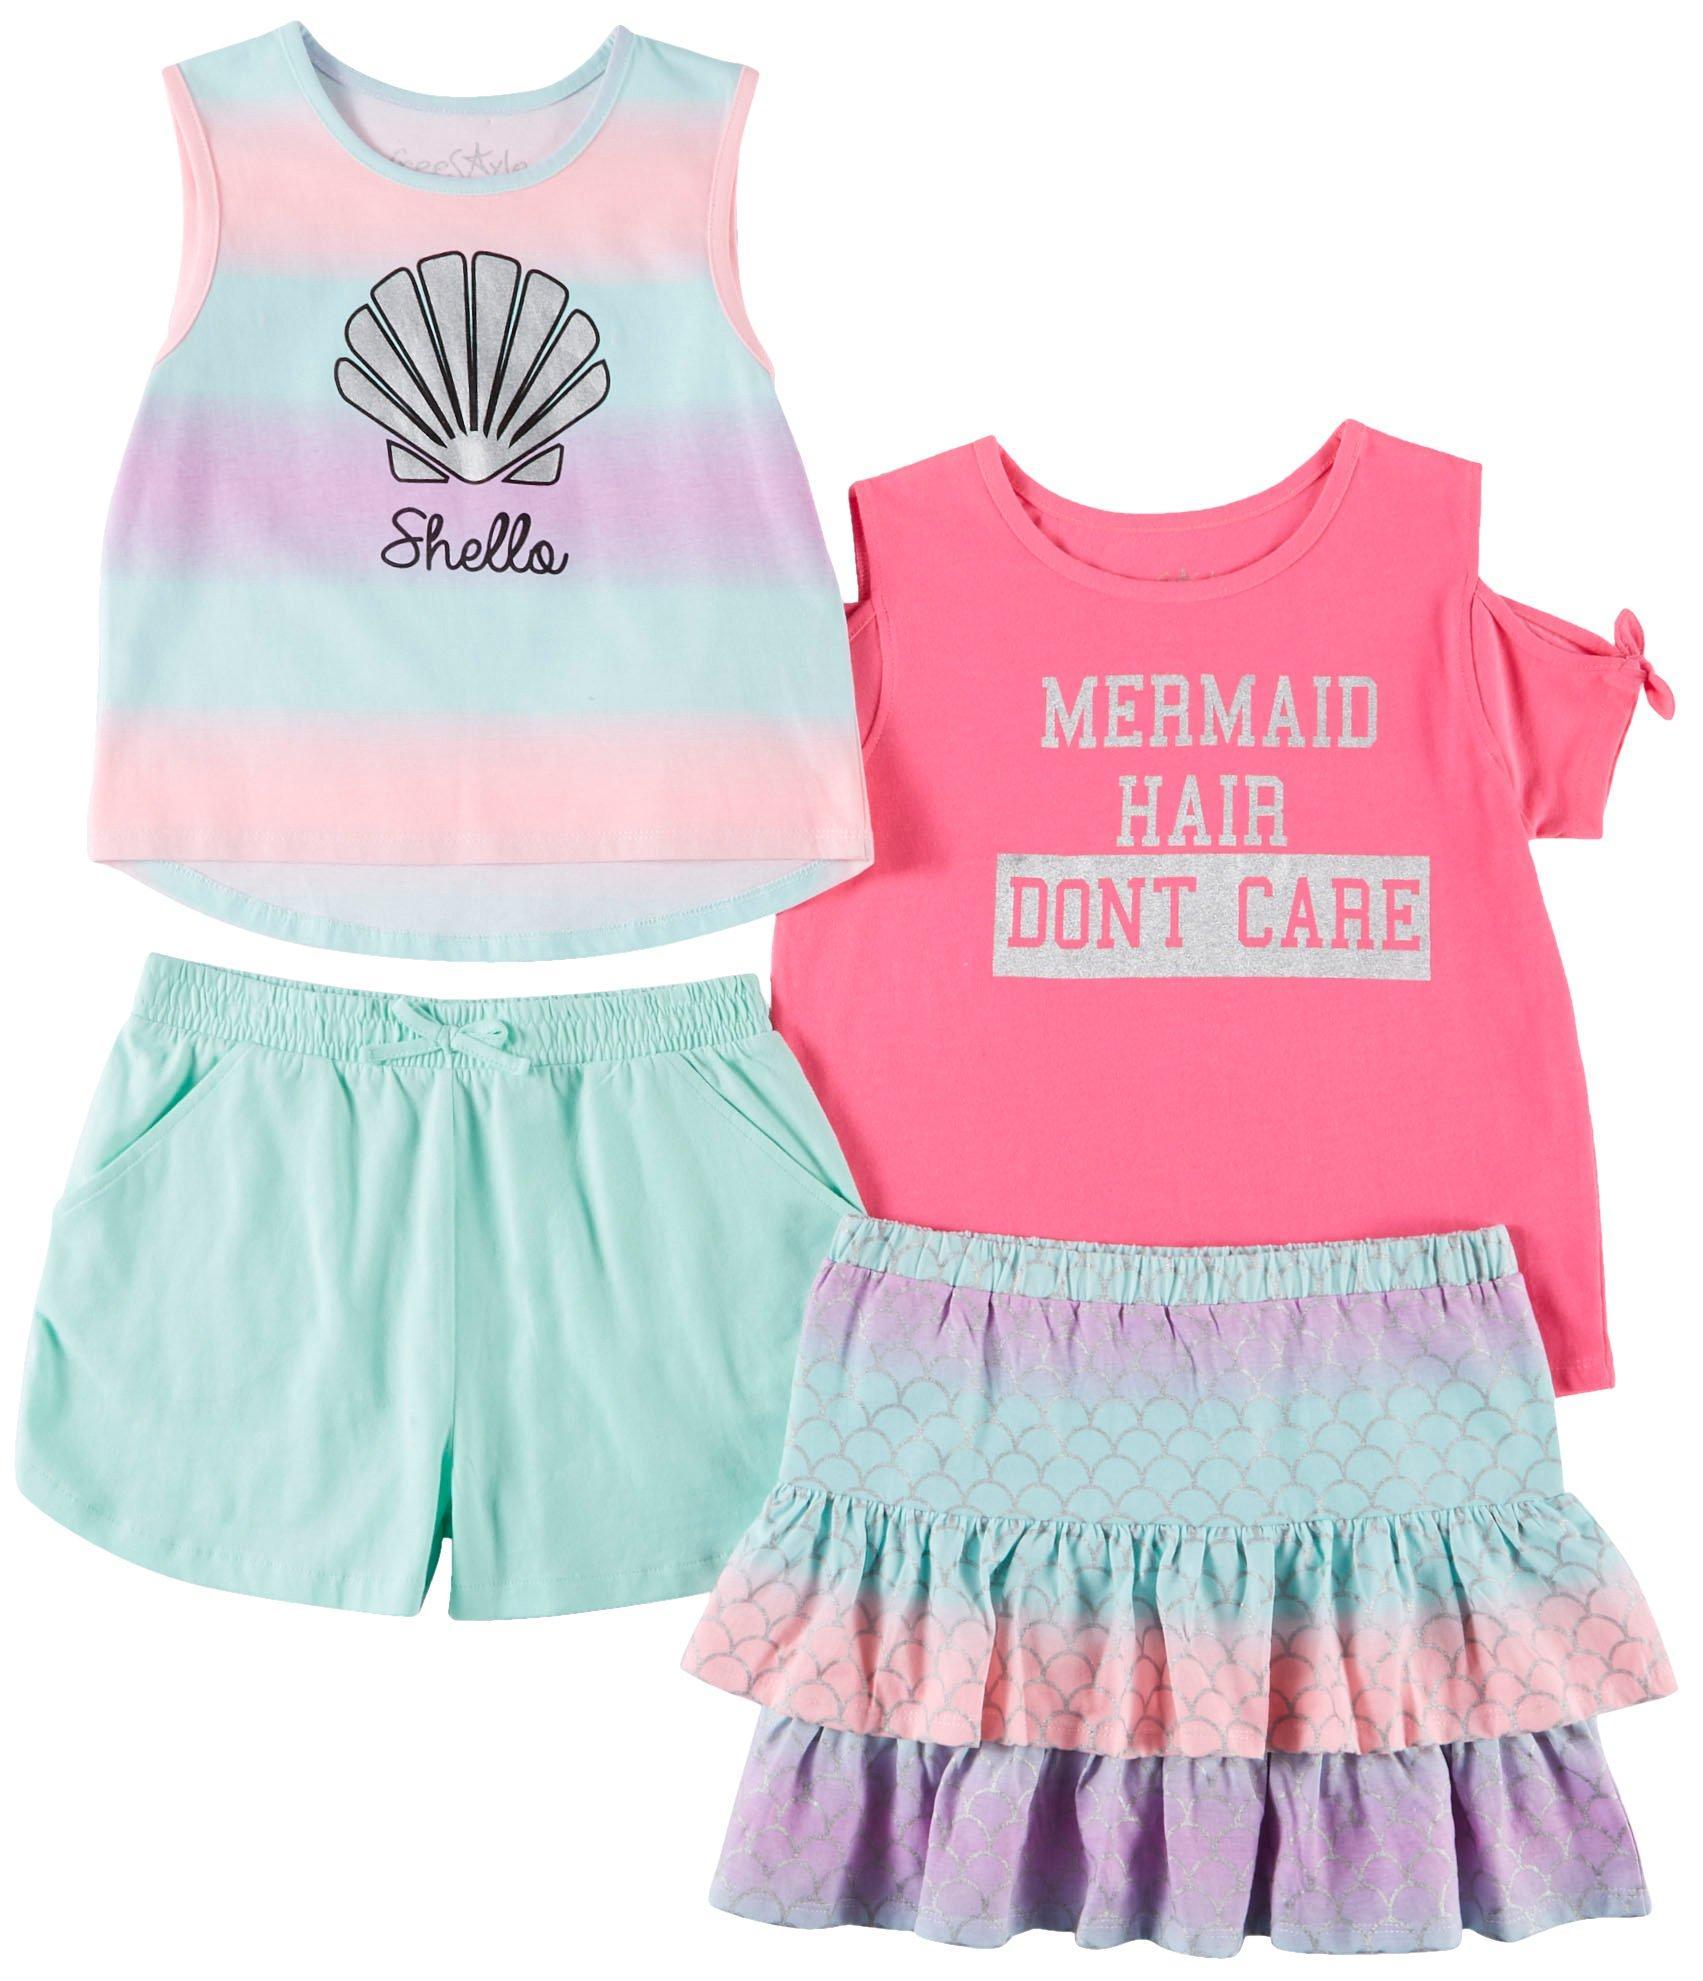 Toddler Girls Sleepwear Lot Of 4 Size 4-5 Moderate Price Disney, Children's Place